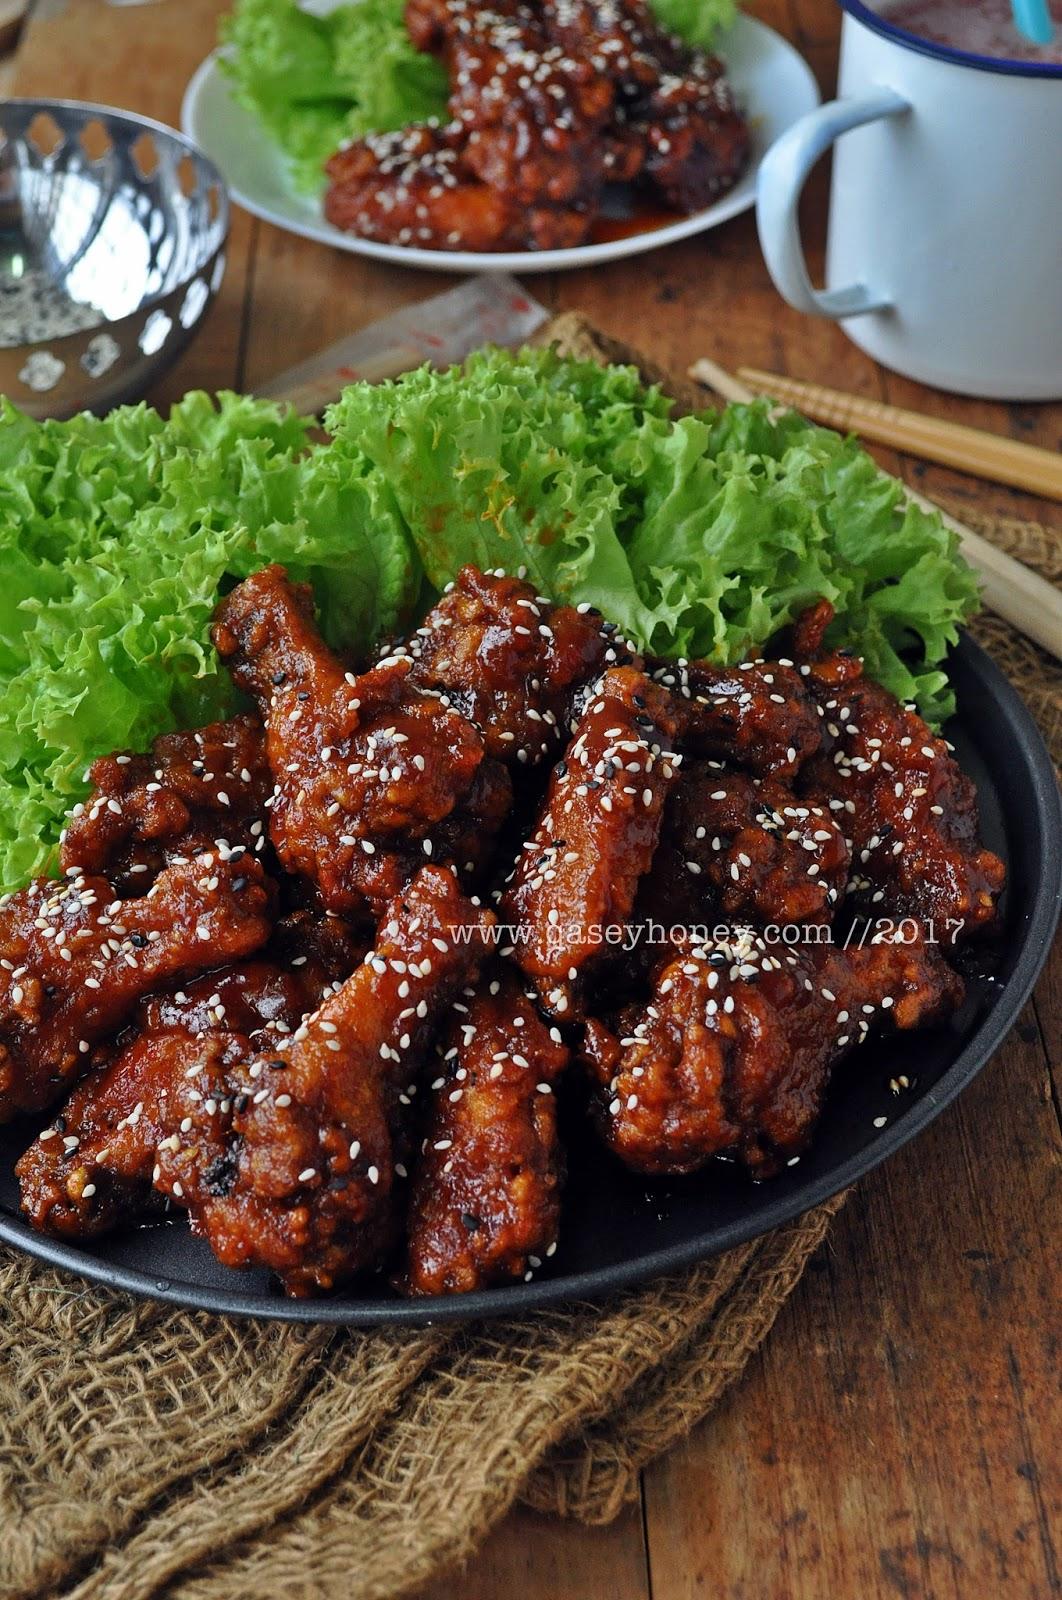 Ayam Goreng Pedas Ala Korea Korean Hot Spicy Fried Chicken Yangnyeom Chicken Qasey Honey